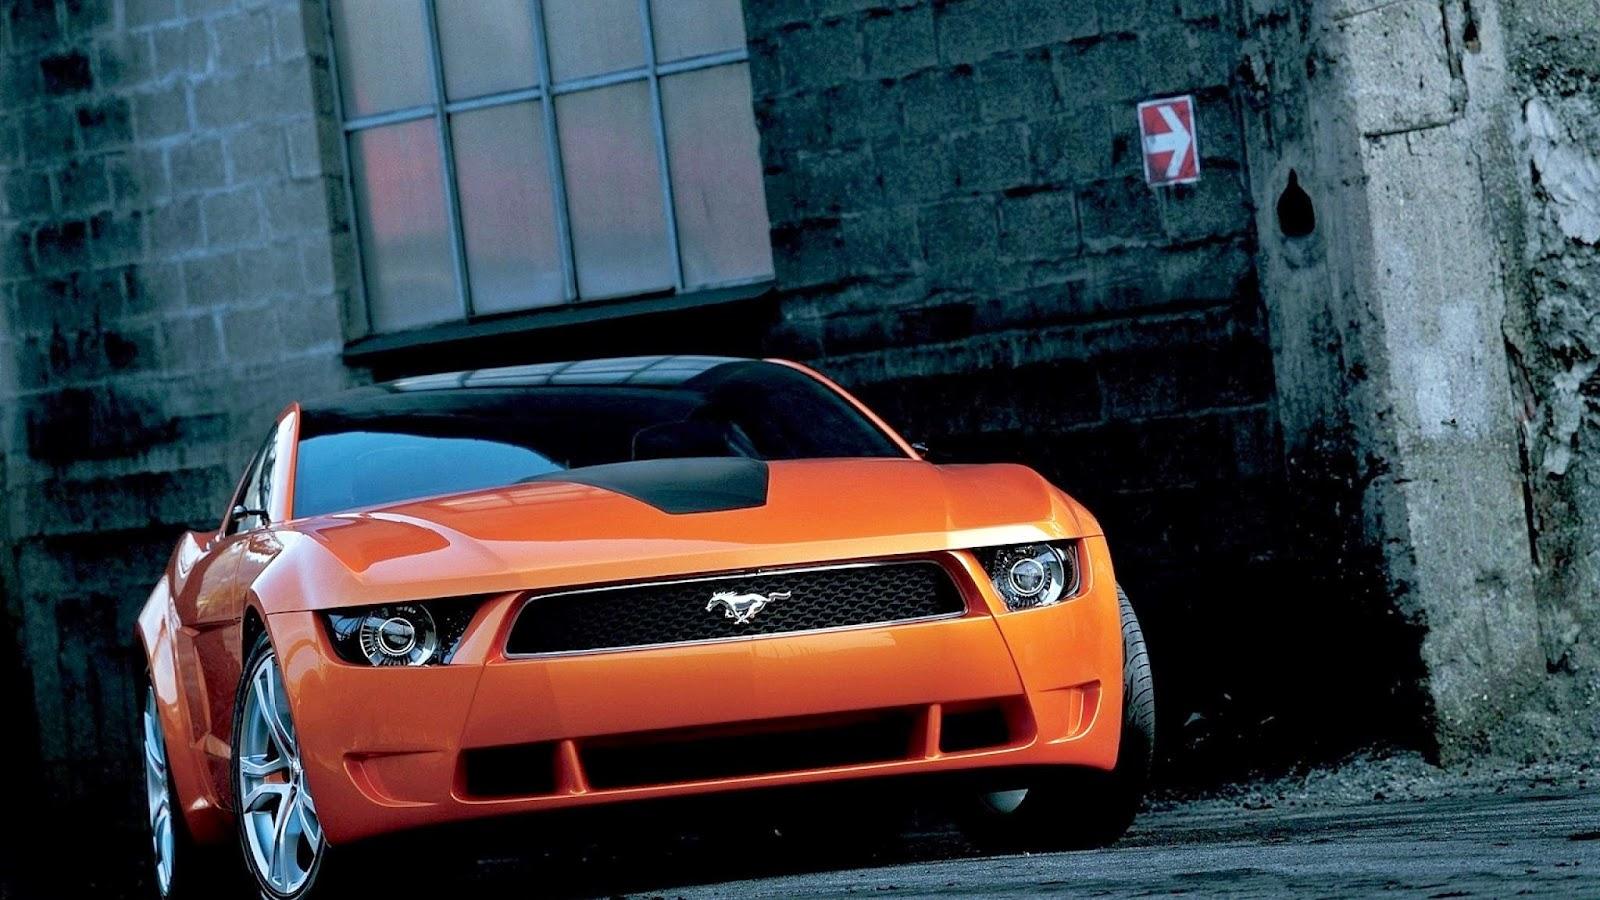 Orange Ferrari Car HD Wallpaper